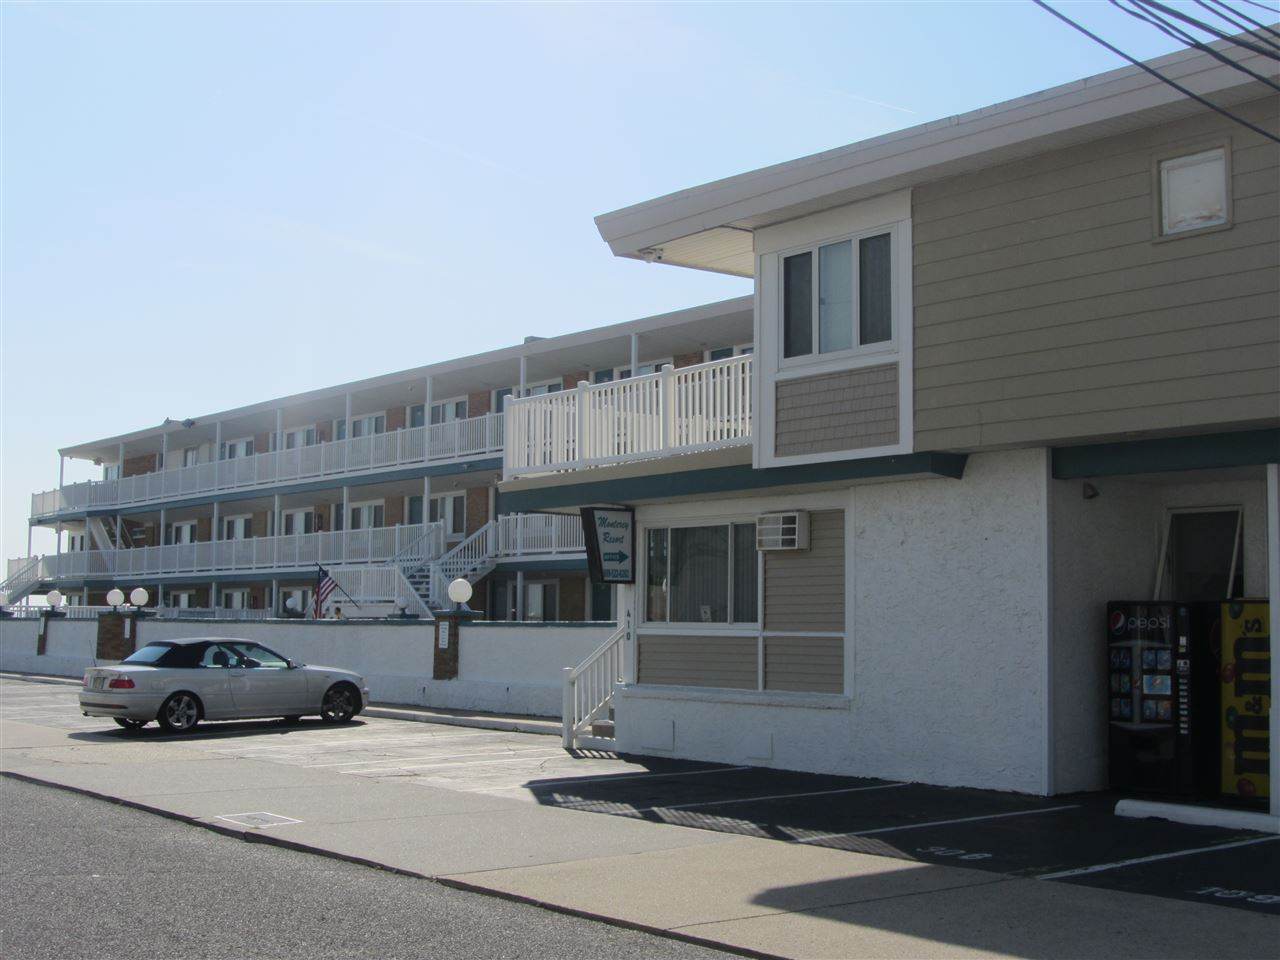 406-10, Unit #306 Monterey, Wildwood Crest